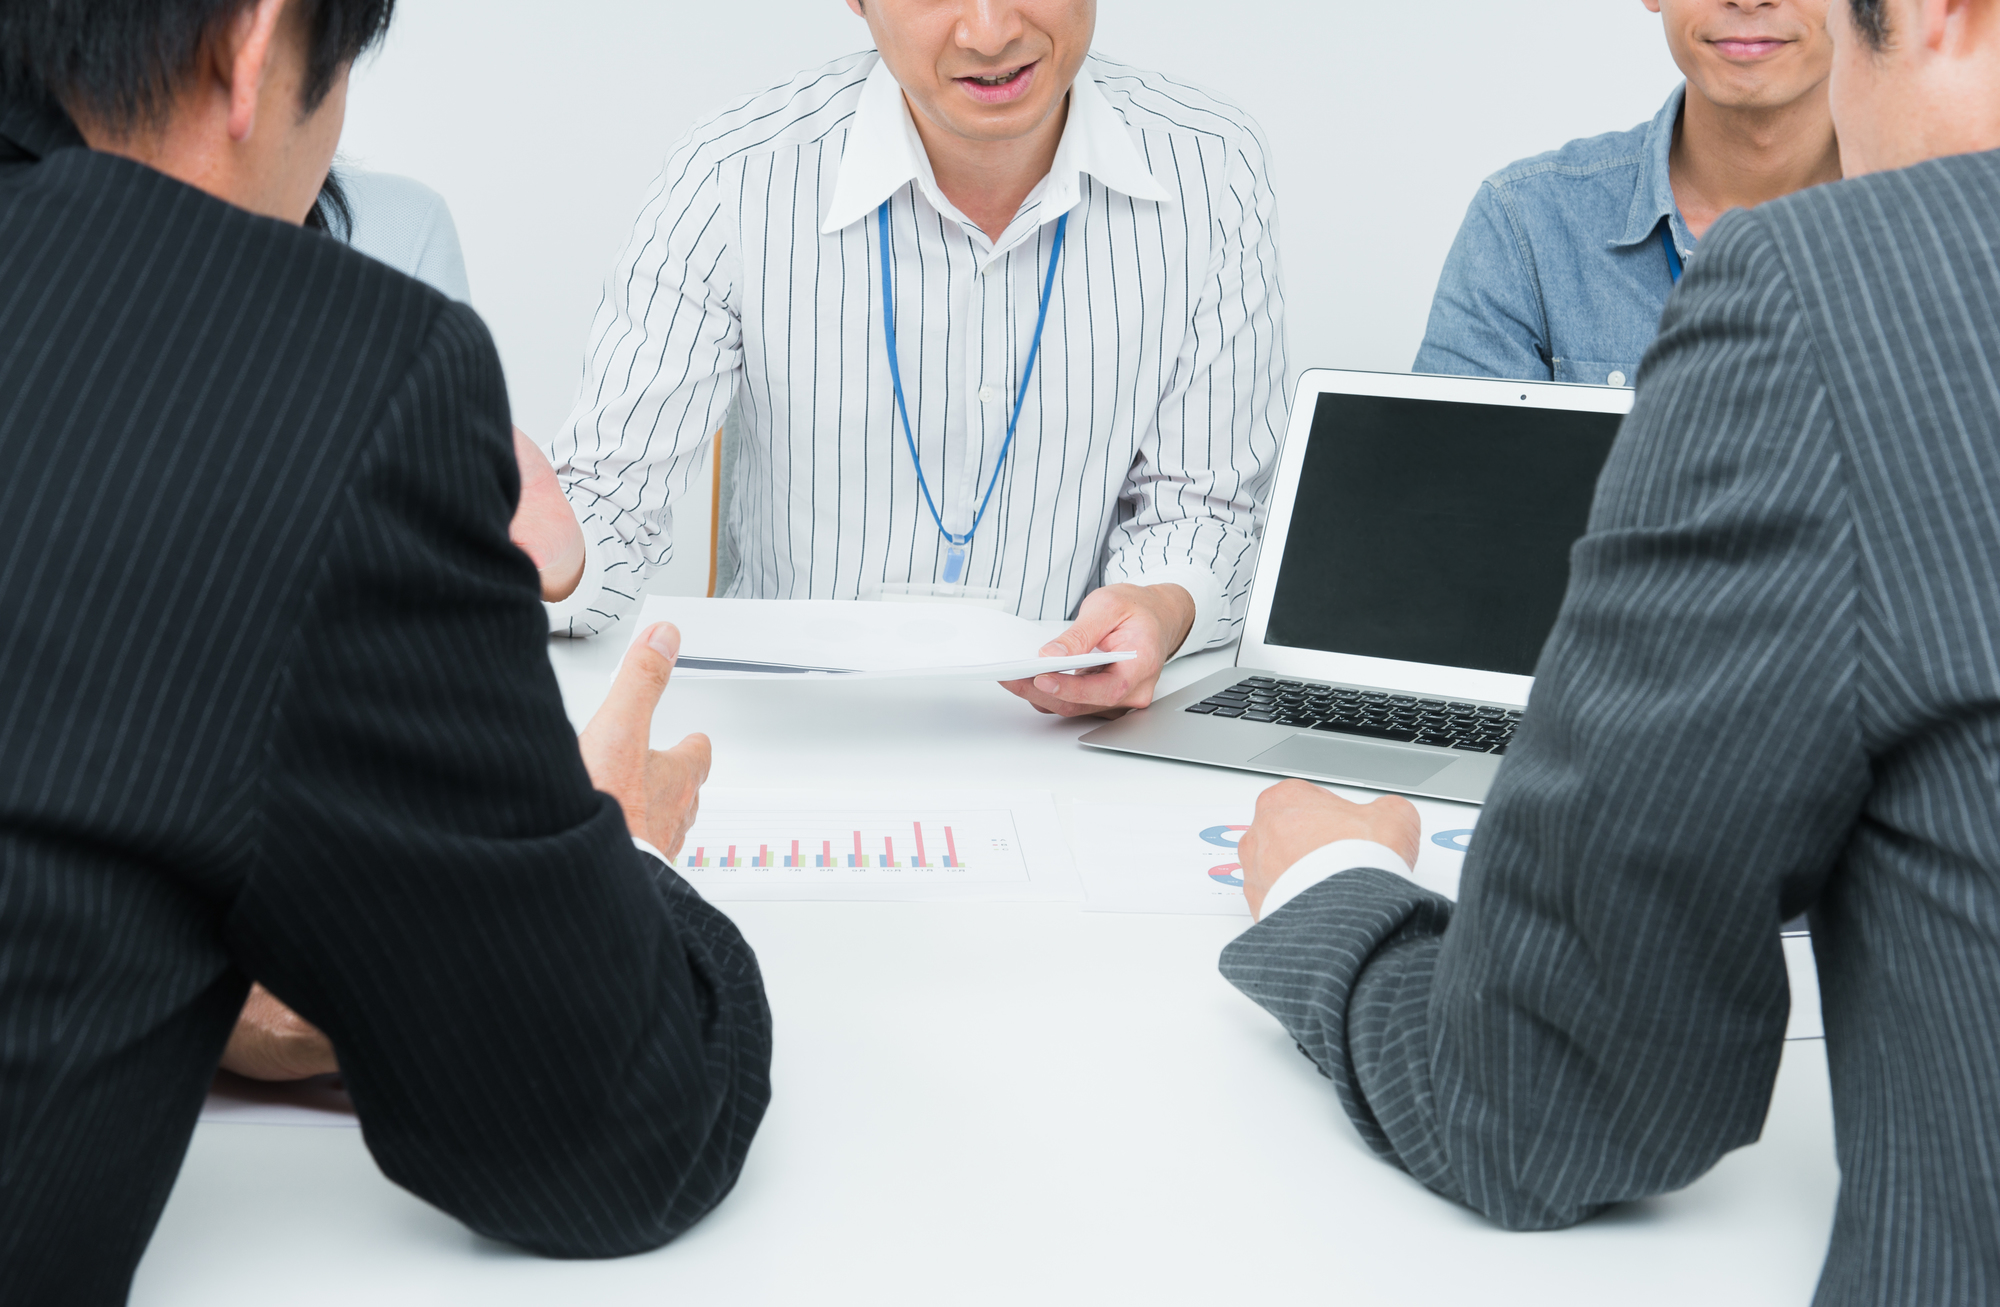 CS品質向上のための豊富なサービスメニュー